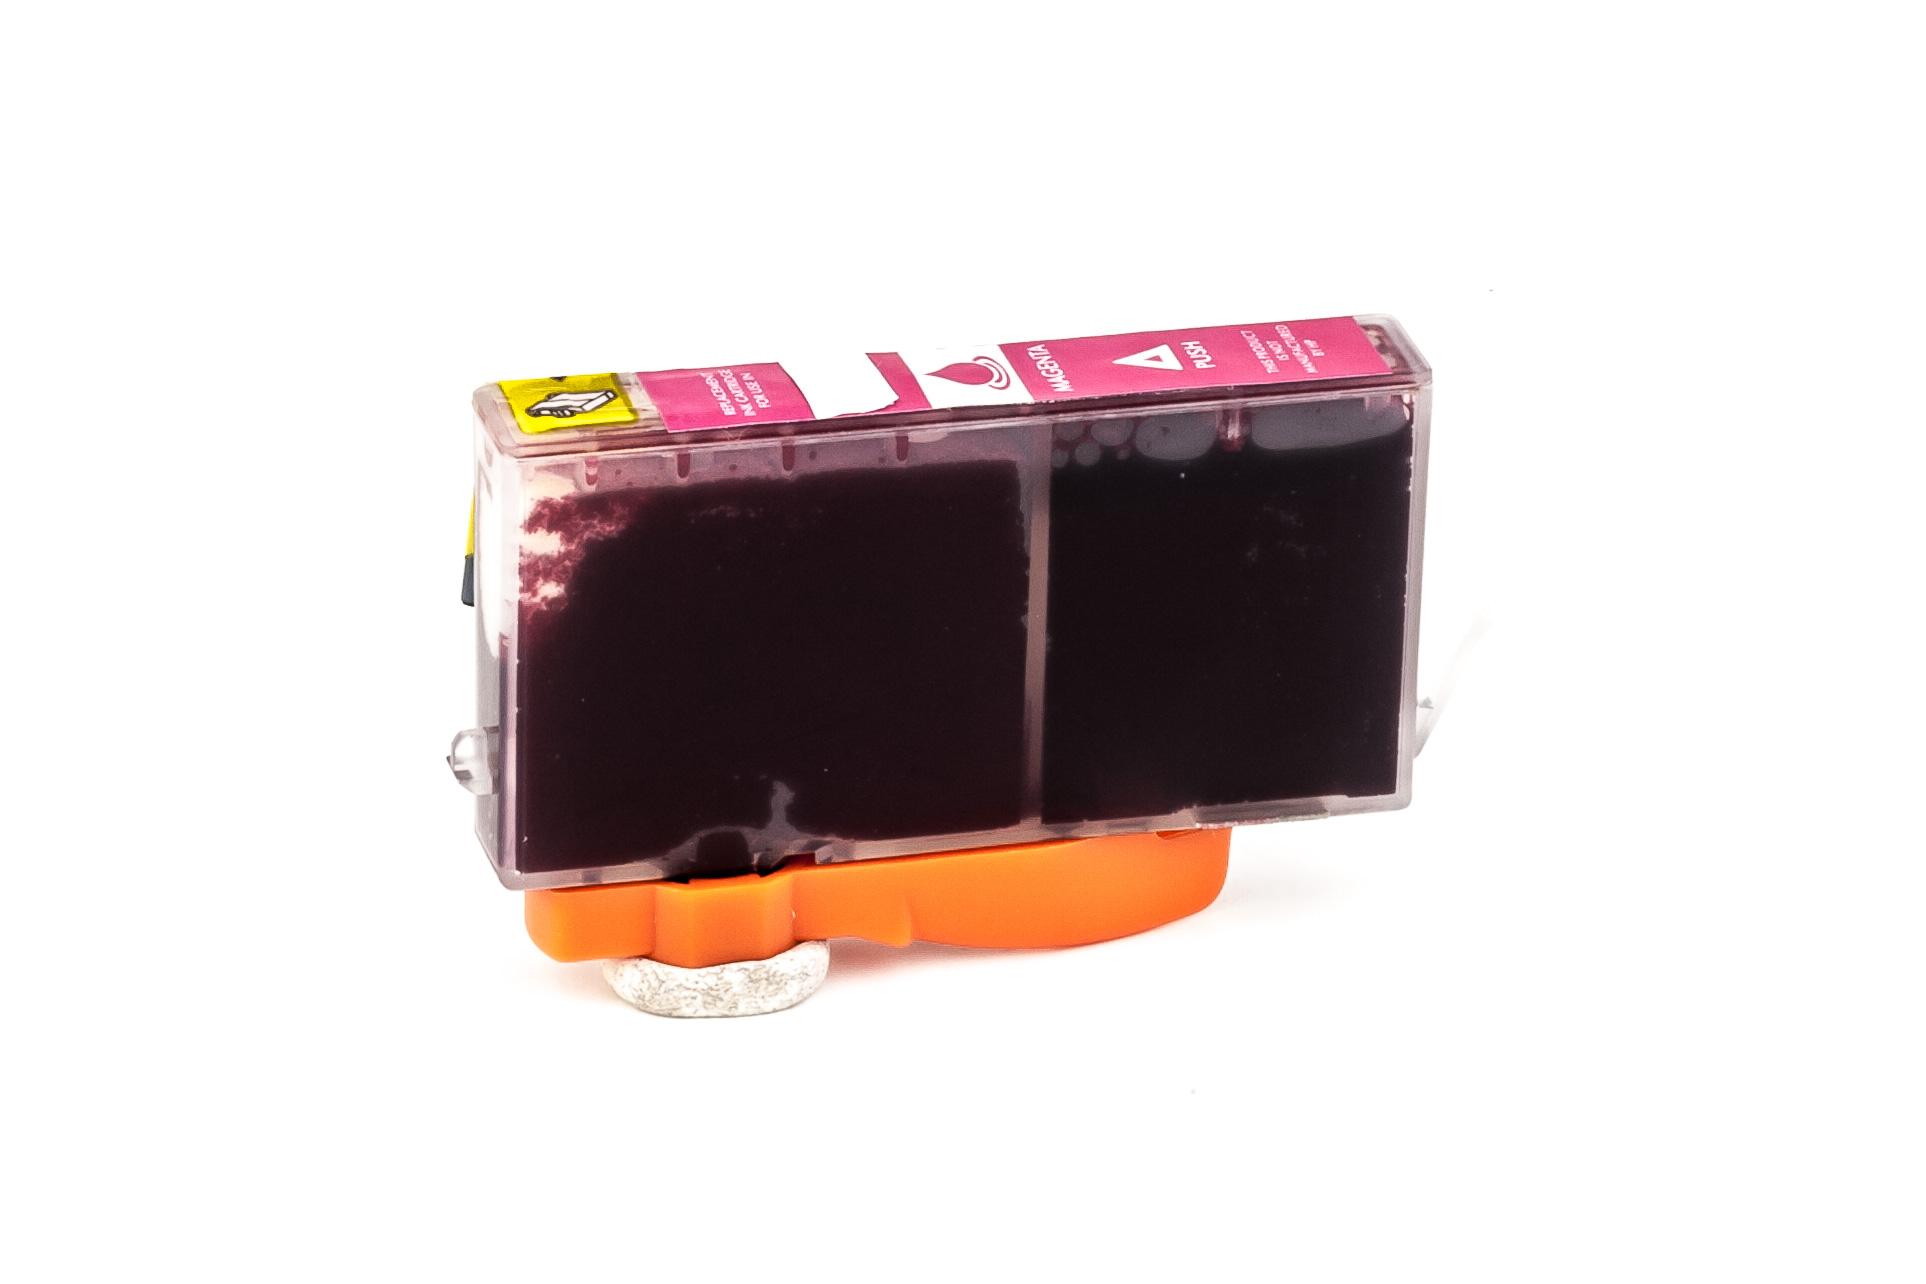 ASC-Premium-Tintenpatrone für HP PhotoSmart eStation magenta XL-Version PhotoSmart eStation PhotoSmarteStation